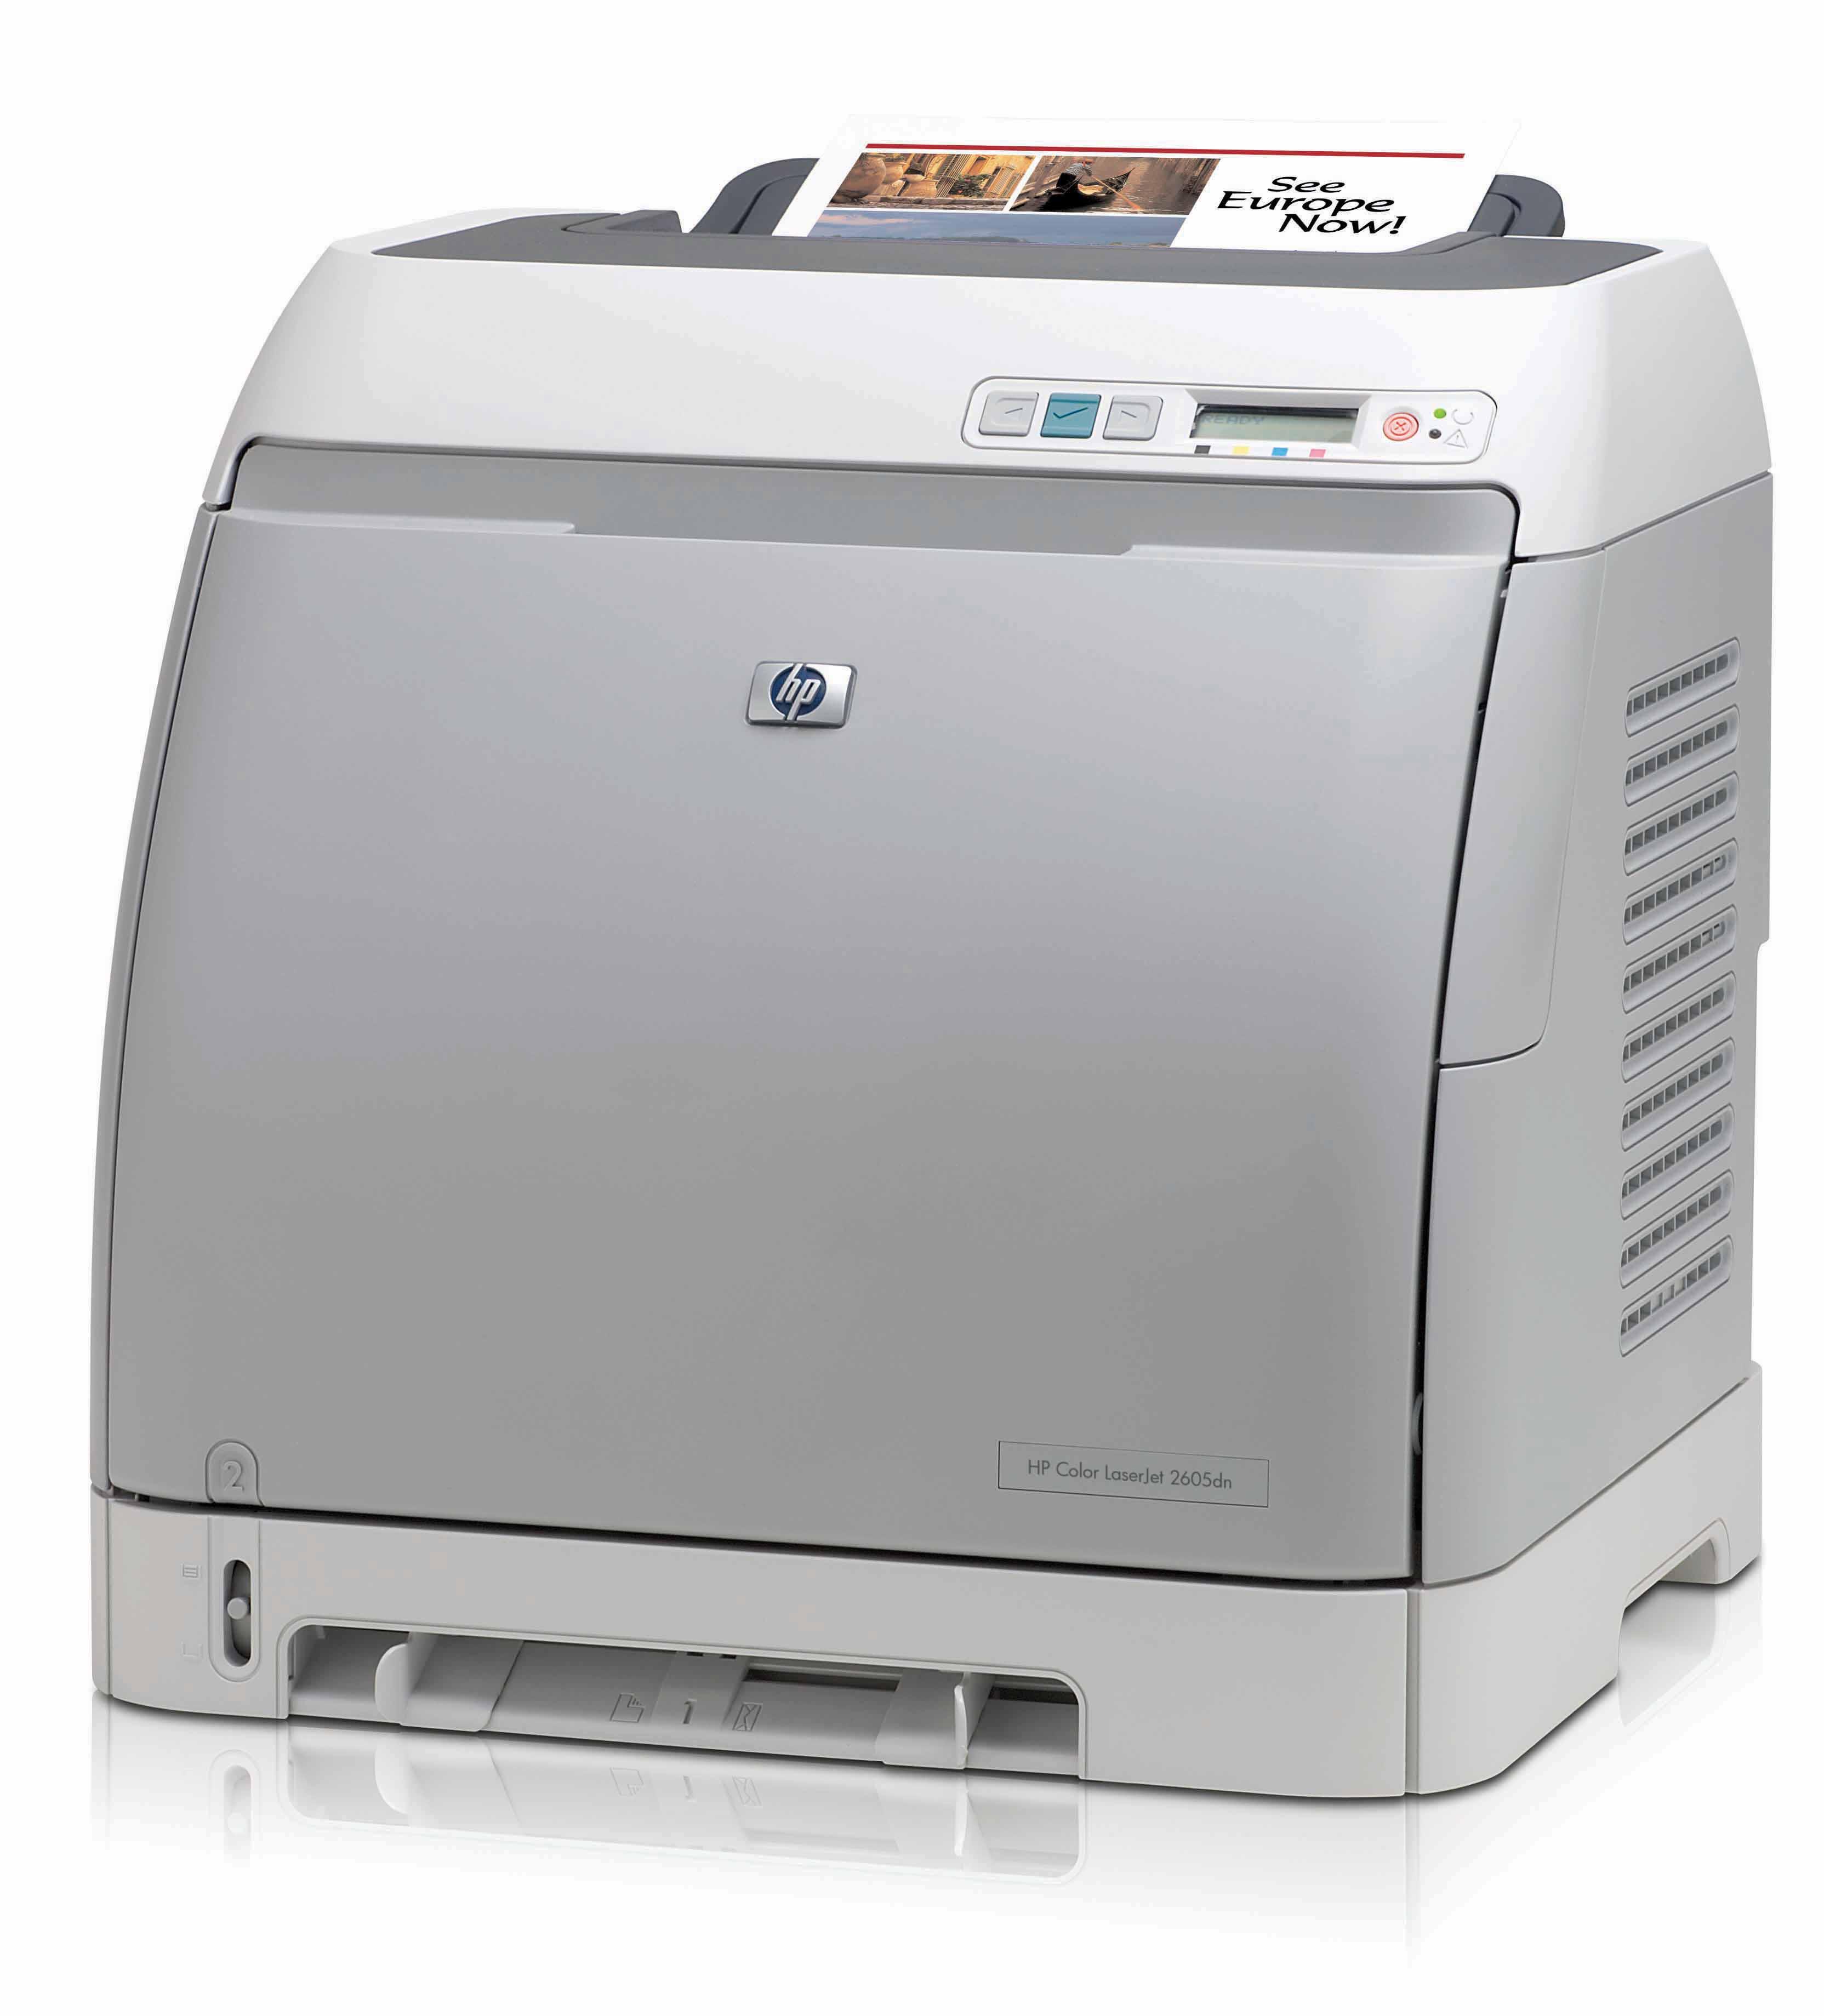 Used Color Laser Printers For Sale In Karachi